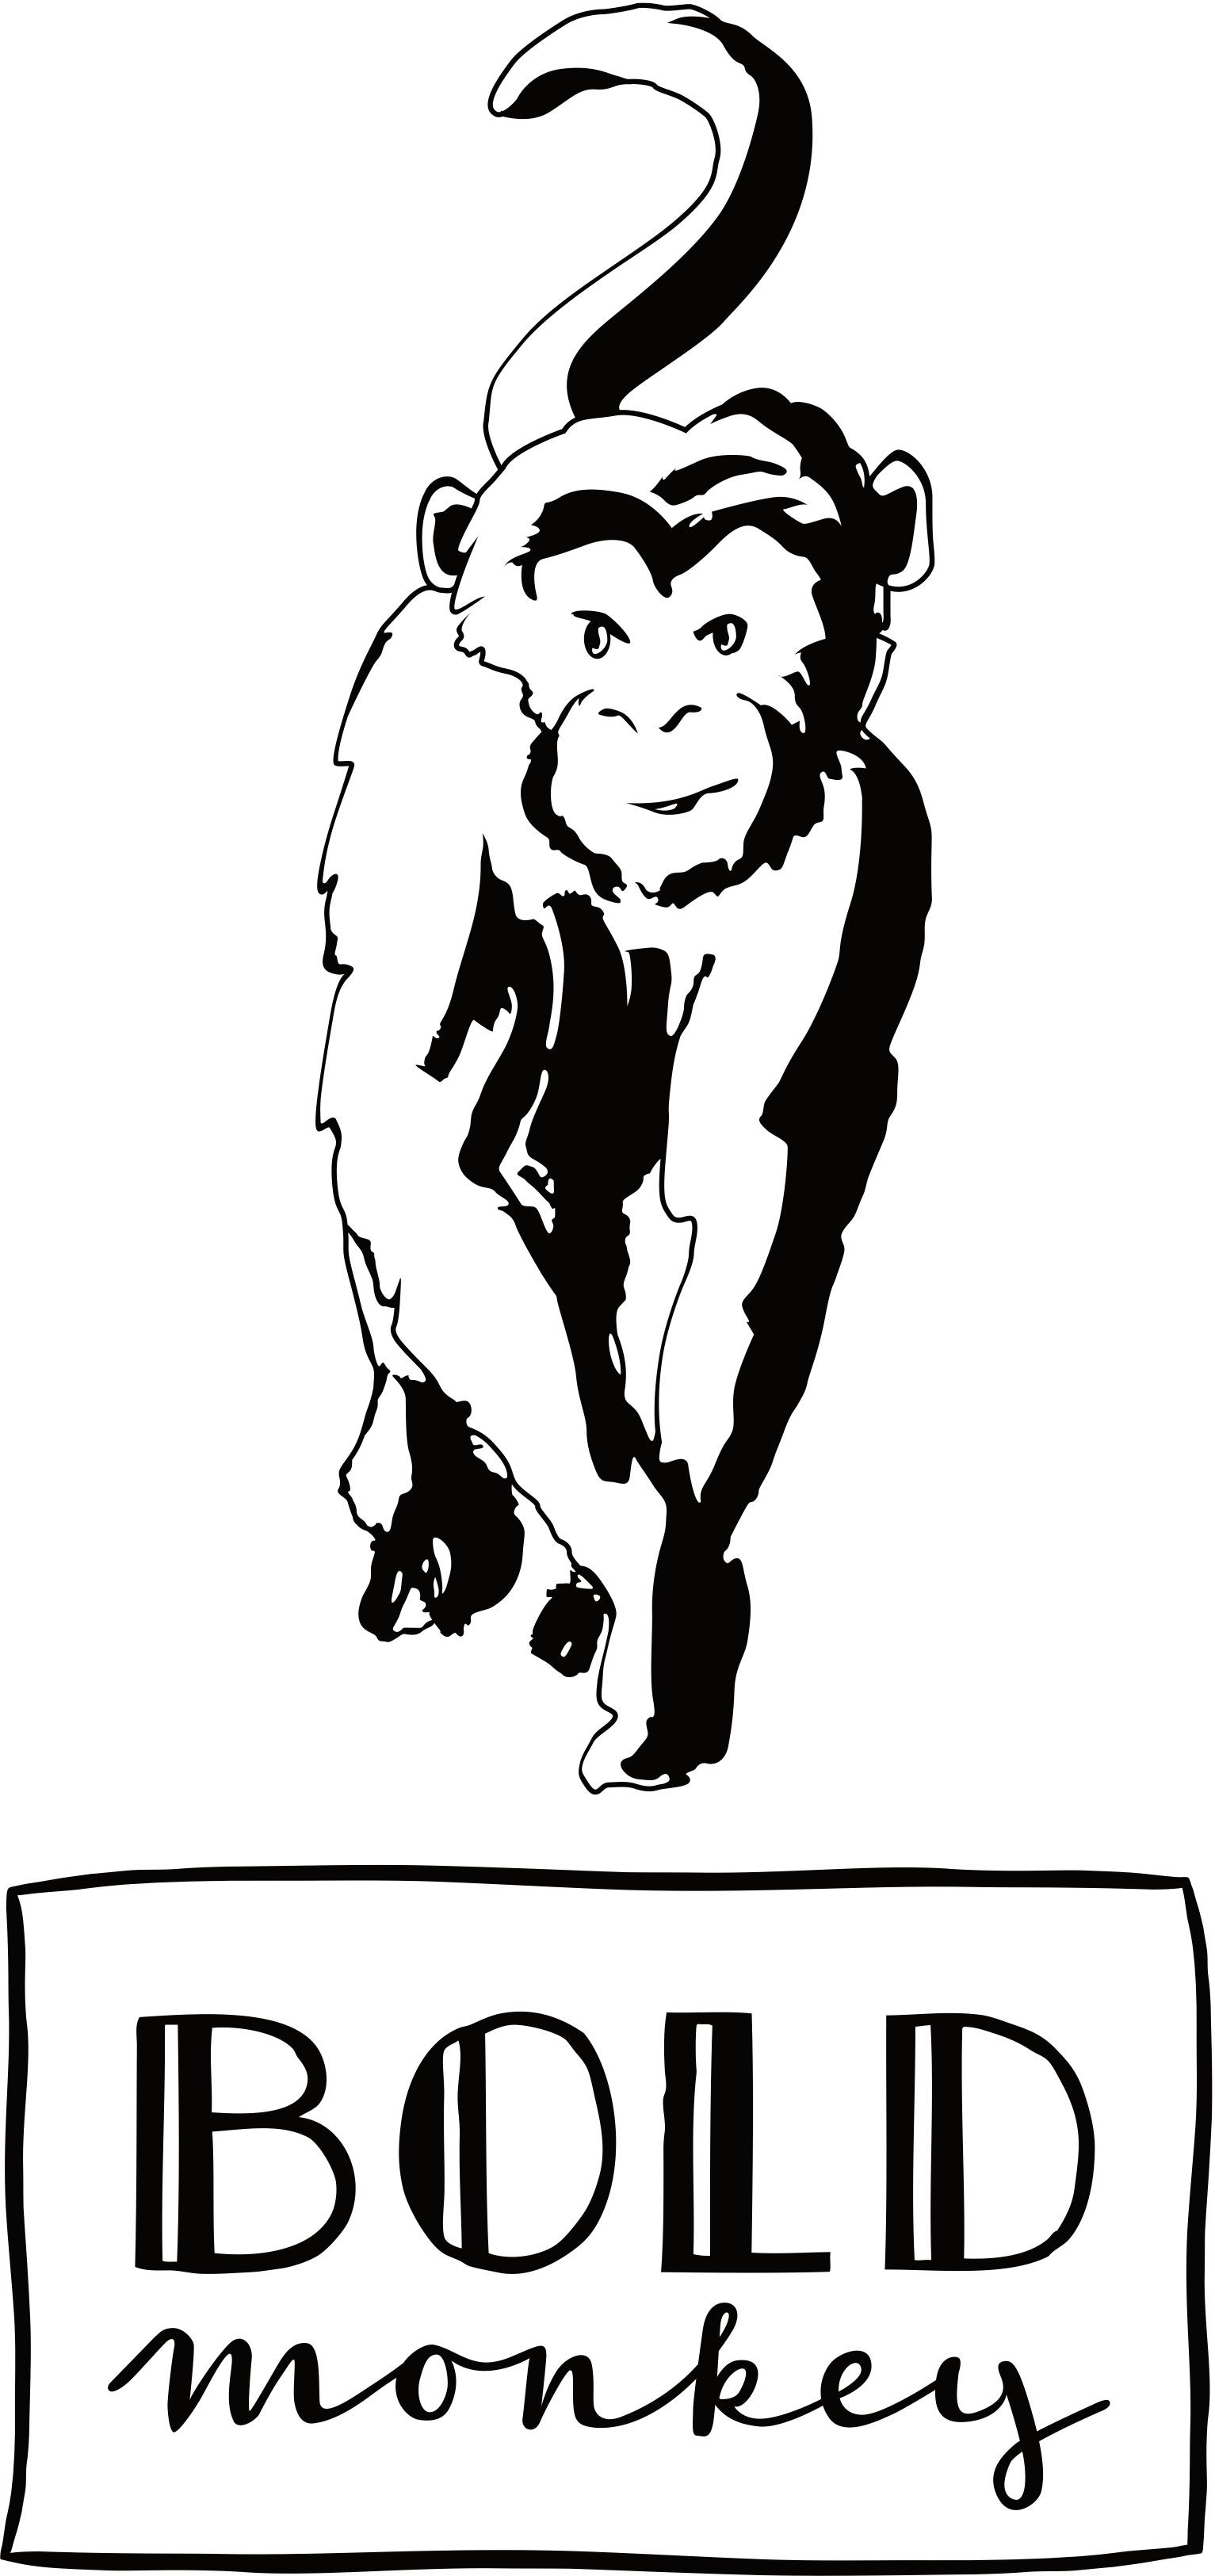 Bold Monkey Dope as hell koffietafel salontafel - Limited Edition zwarte panter met zwarte glazen blad zijaanzicht